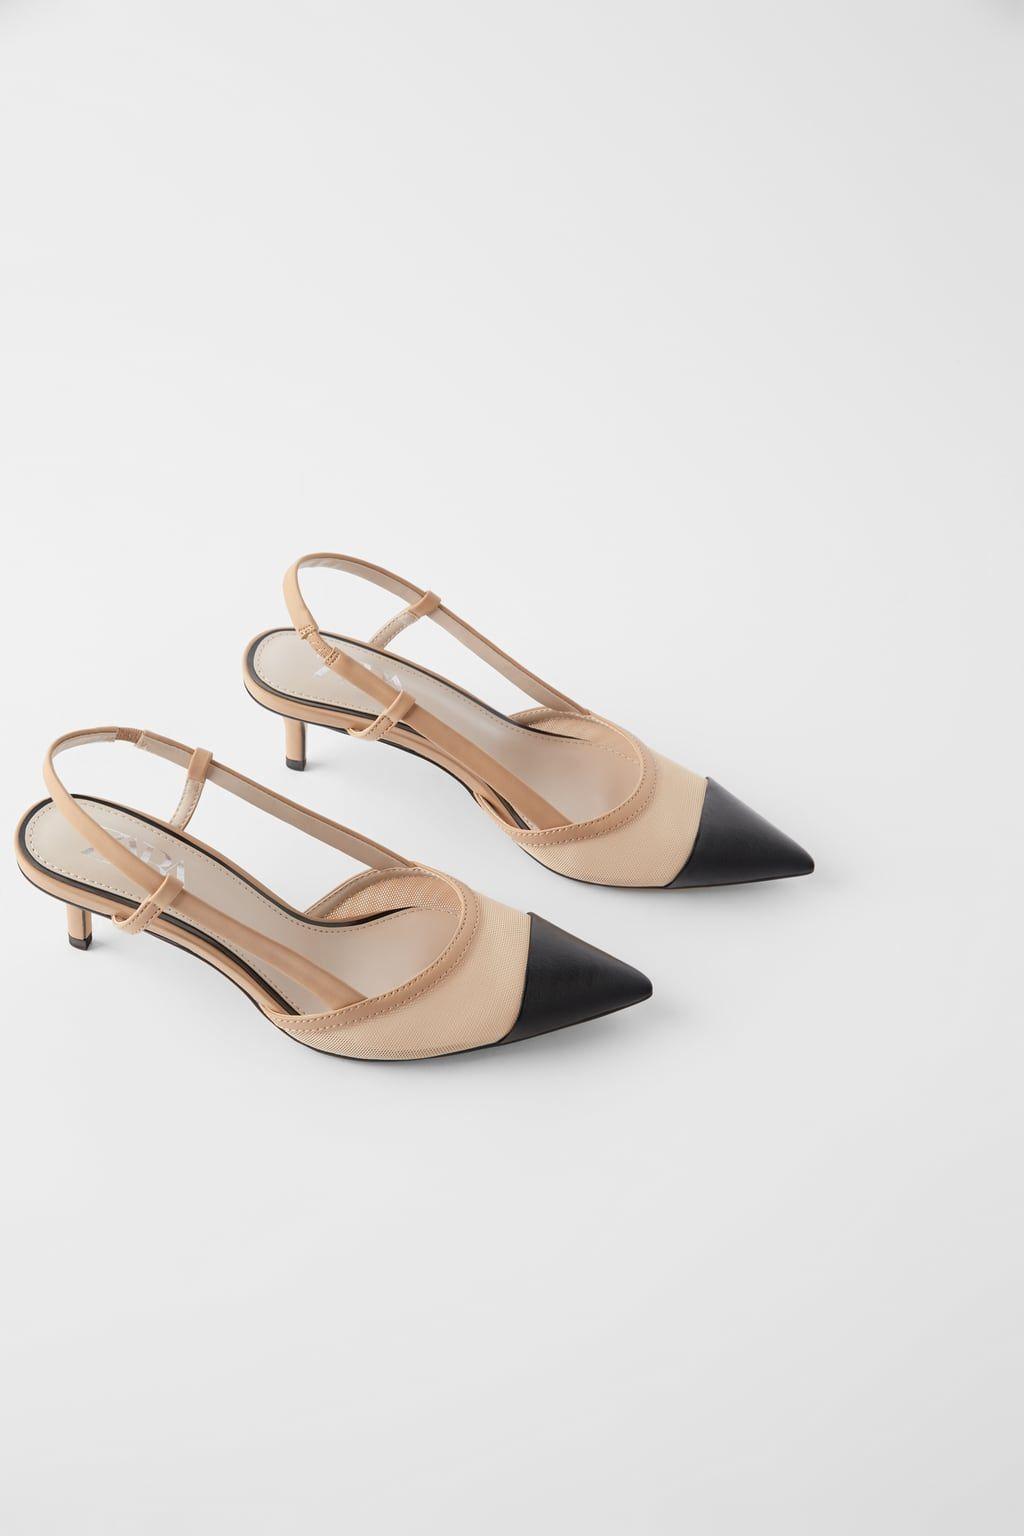 Mesh Slingback Heels View All Shoes Woman Zara United States Hal Skor Kvinnoskor